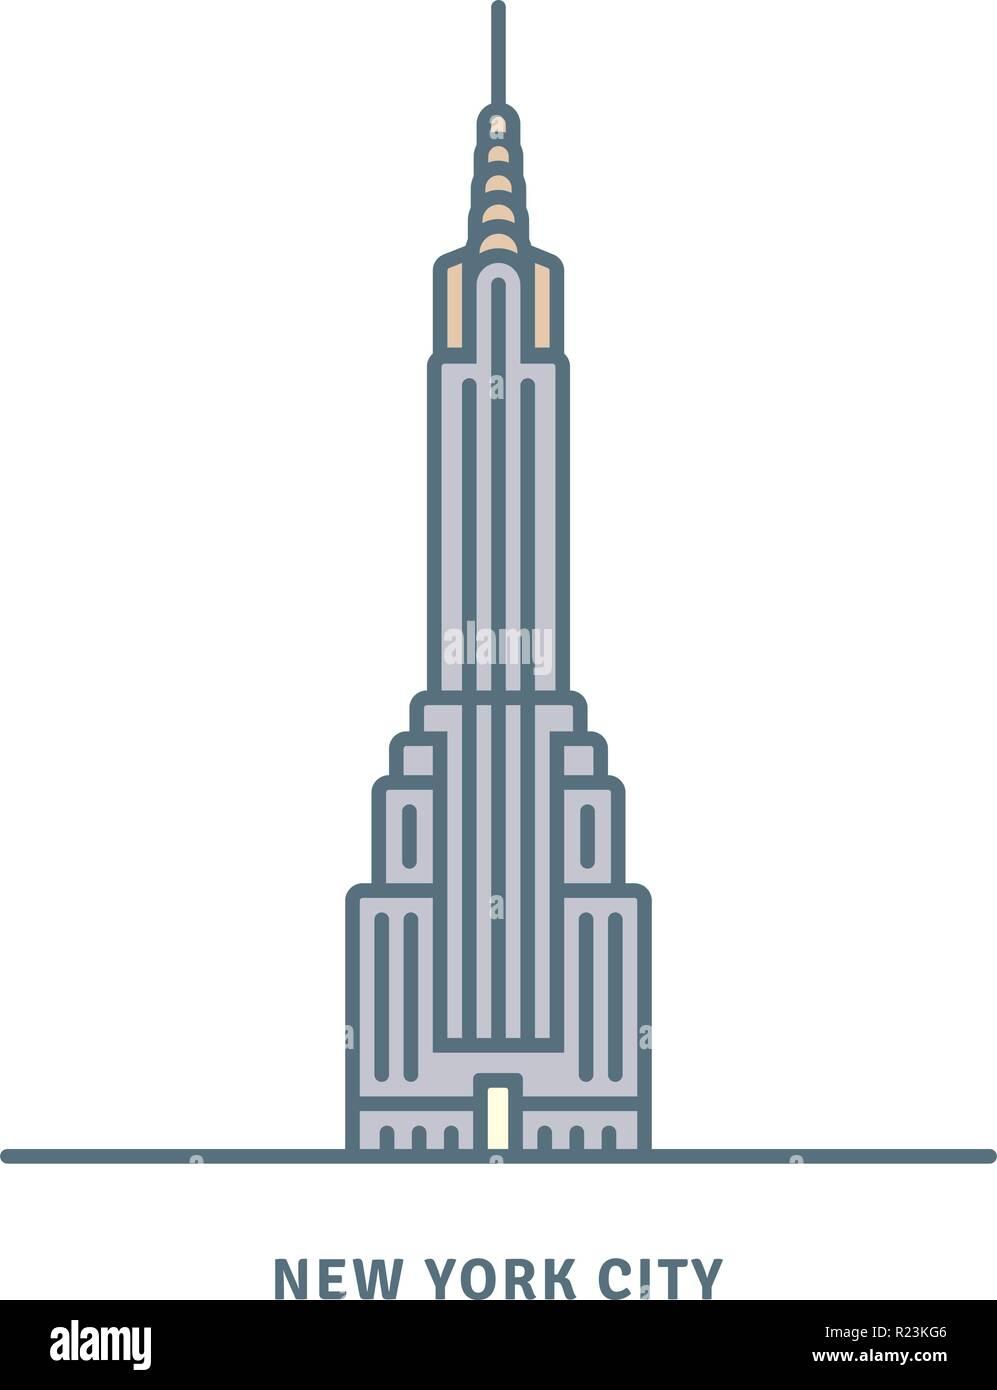 New York City line icon. Chrysler Building skyscraper vector illustration. - Stock Vector